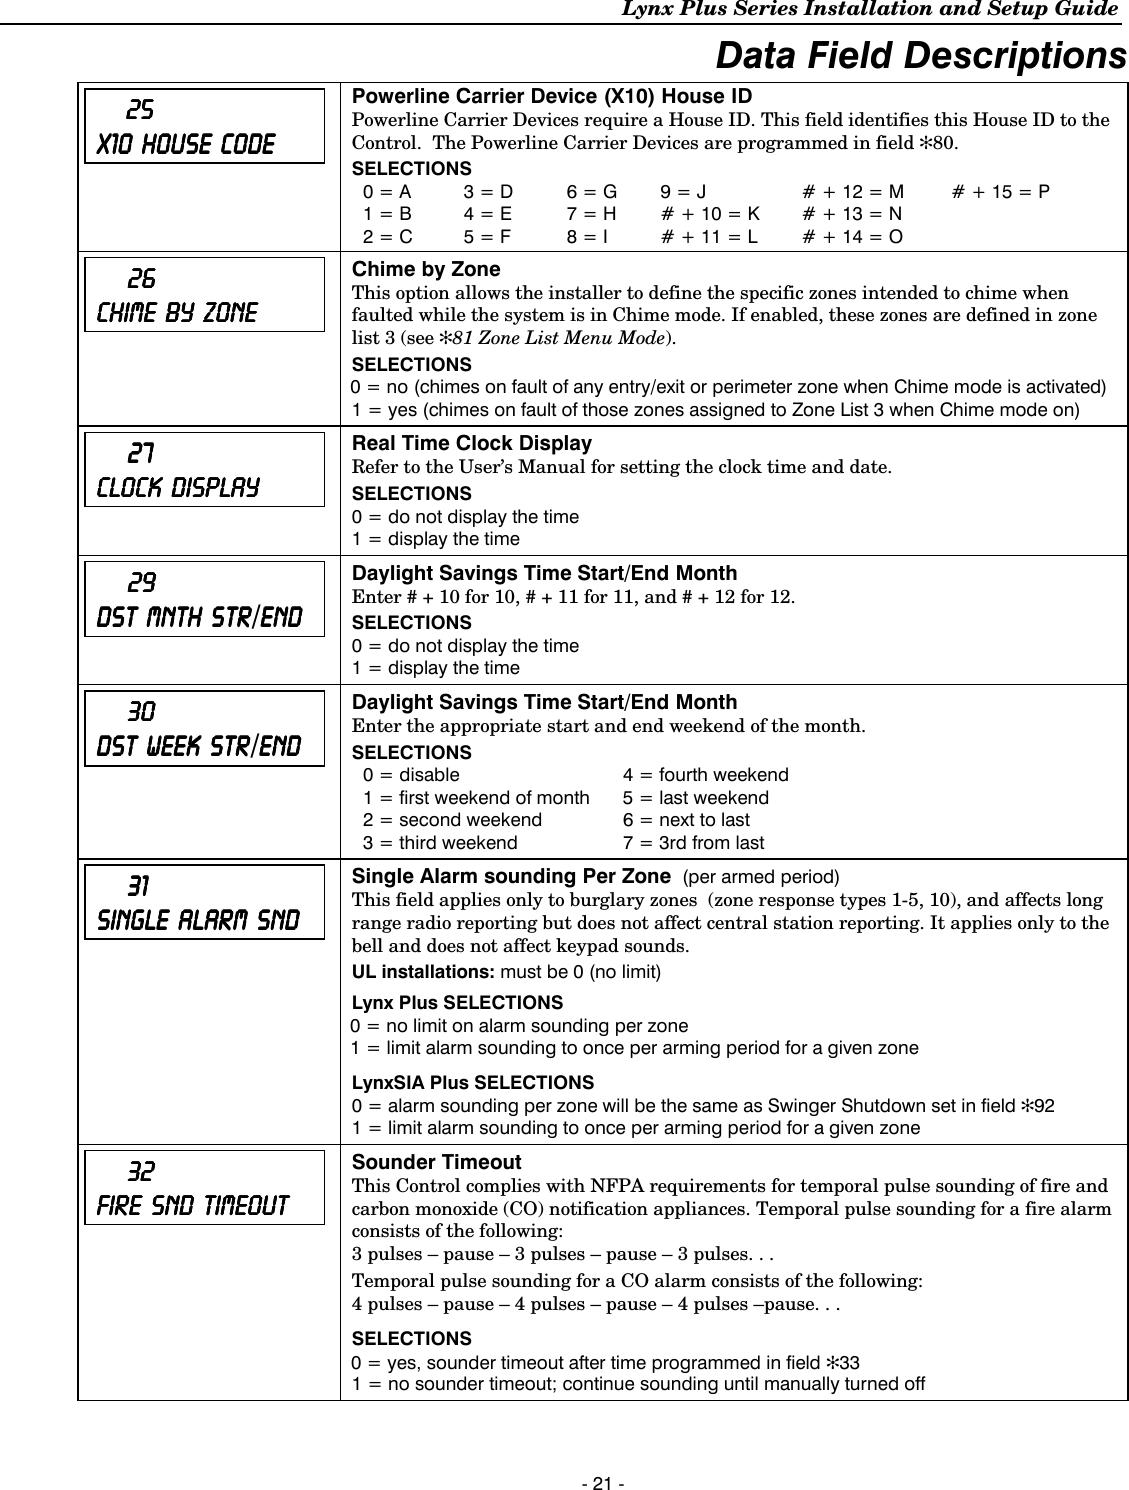 Honeywell 8Dllynxplus2 Wireless Control  Communicator User Manual 800 03857 Ii-1033